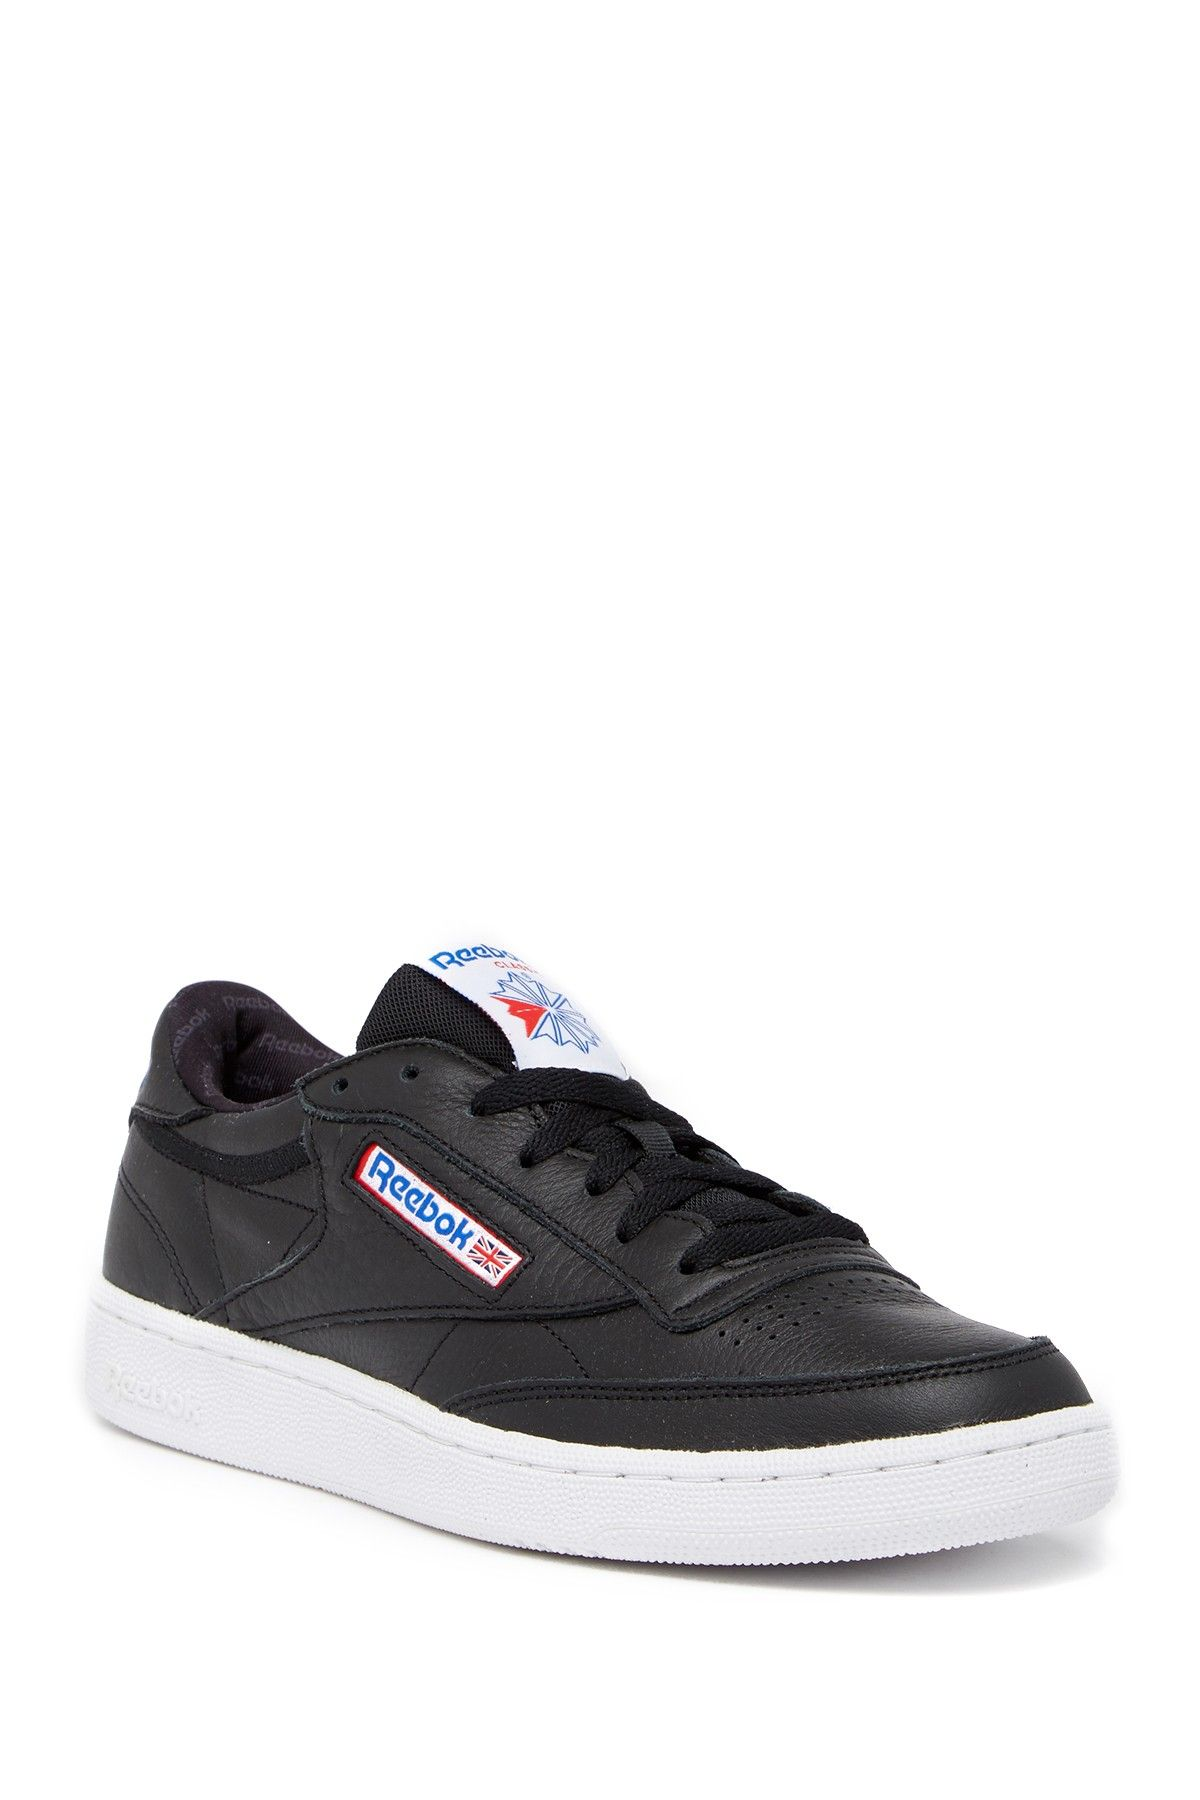 Club C 85 SO Leather Sneaker  1781ae8e9